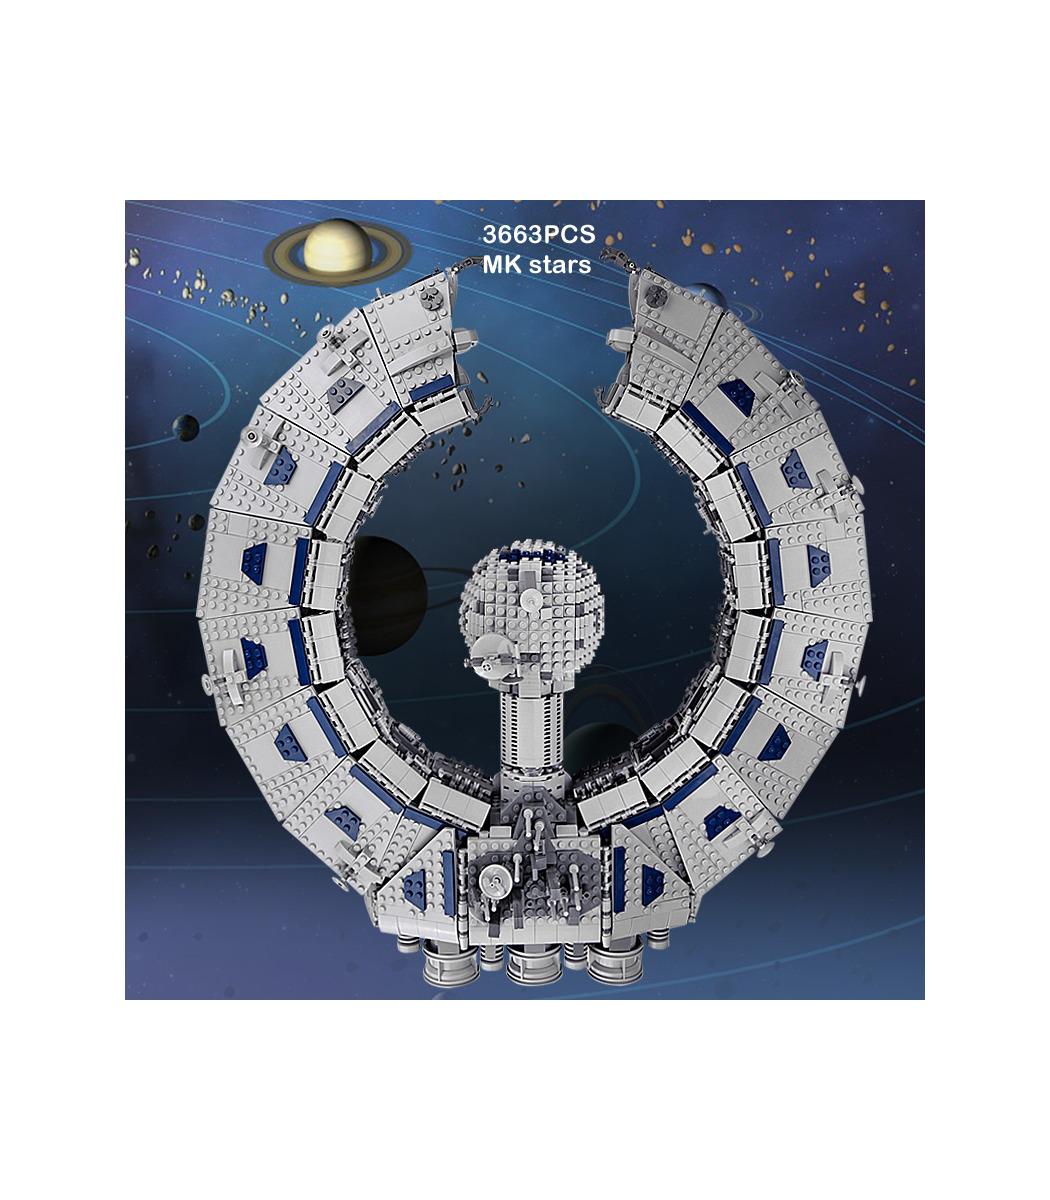 MOULD KING 21008 Lucrehulk Battleship Droid Control Ship Building Blocks Toy Set